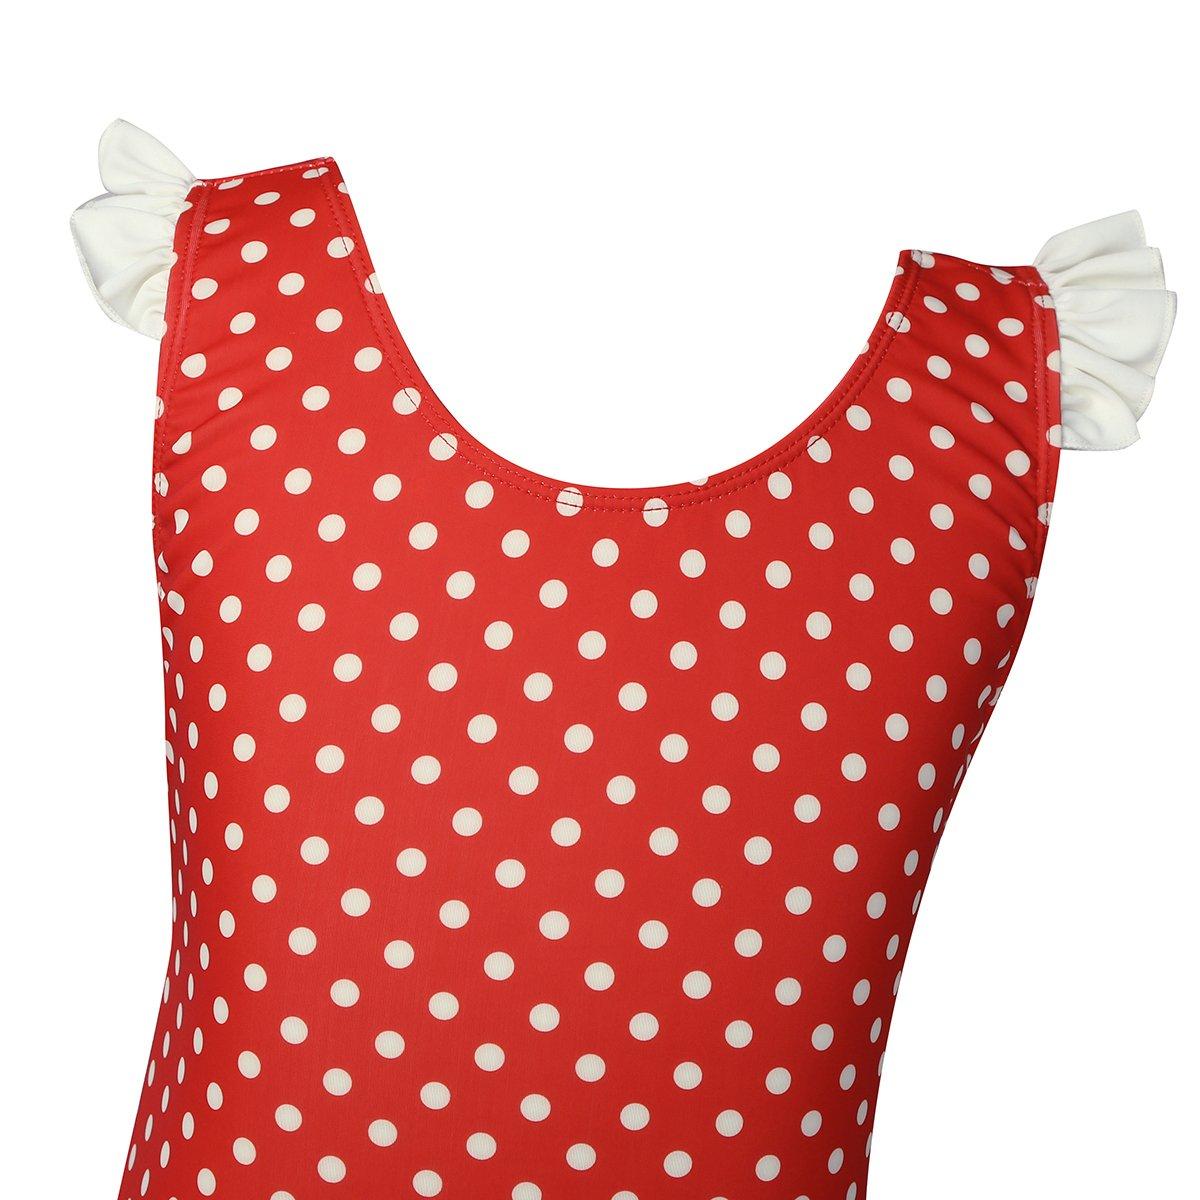 ranrann Girls One Piece V-Back Sleeveless Swimsuit Ruffle Bowknot Polka Dots Swimwear Bathing Suit